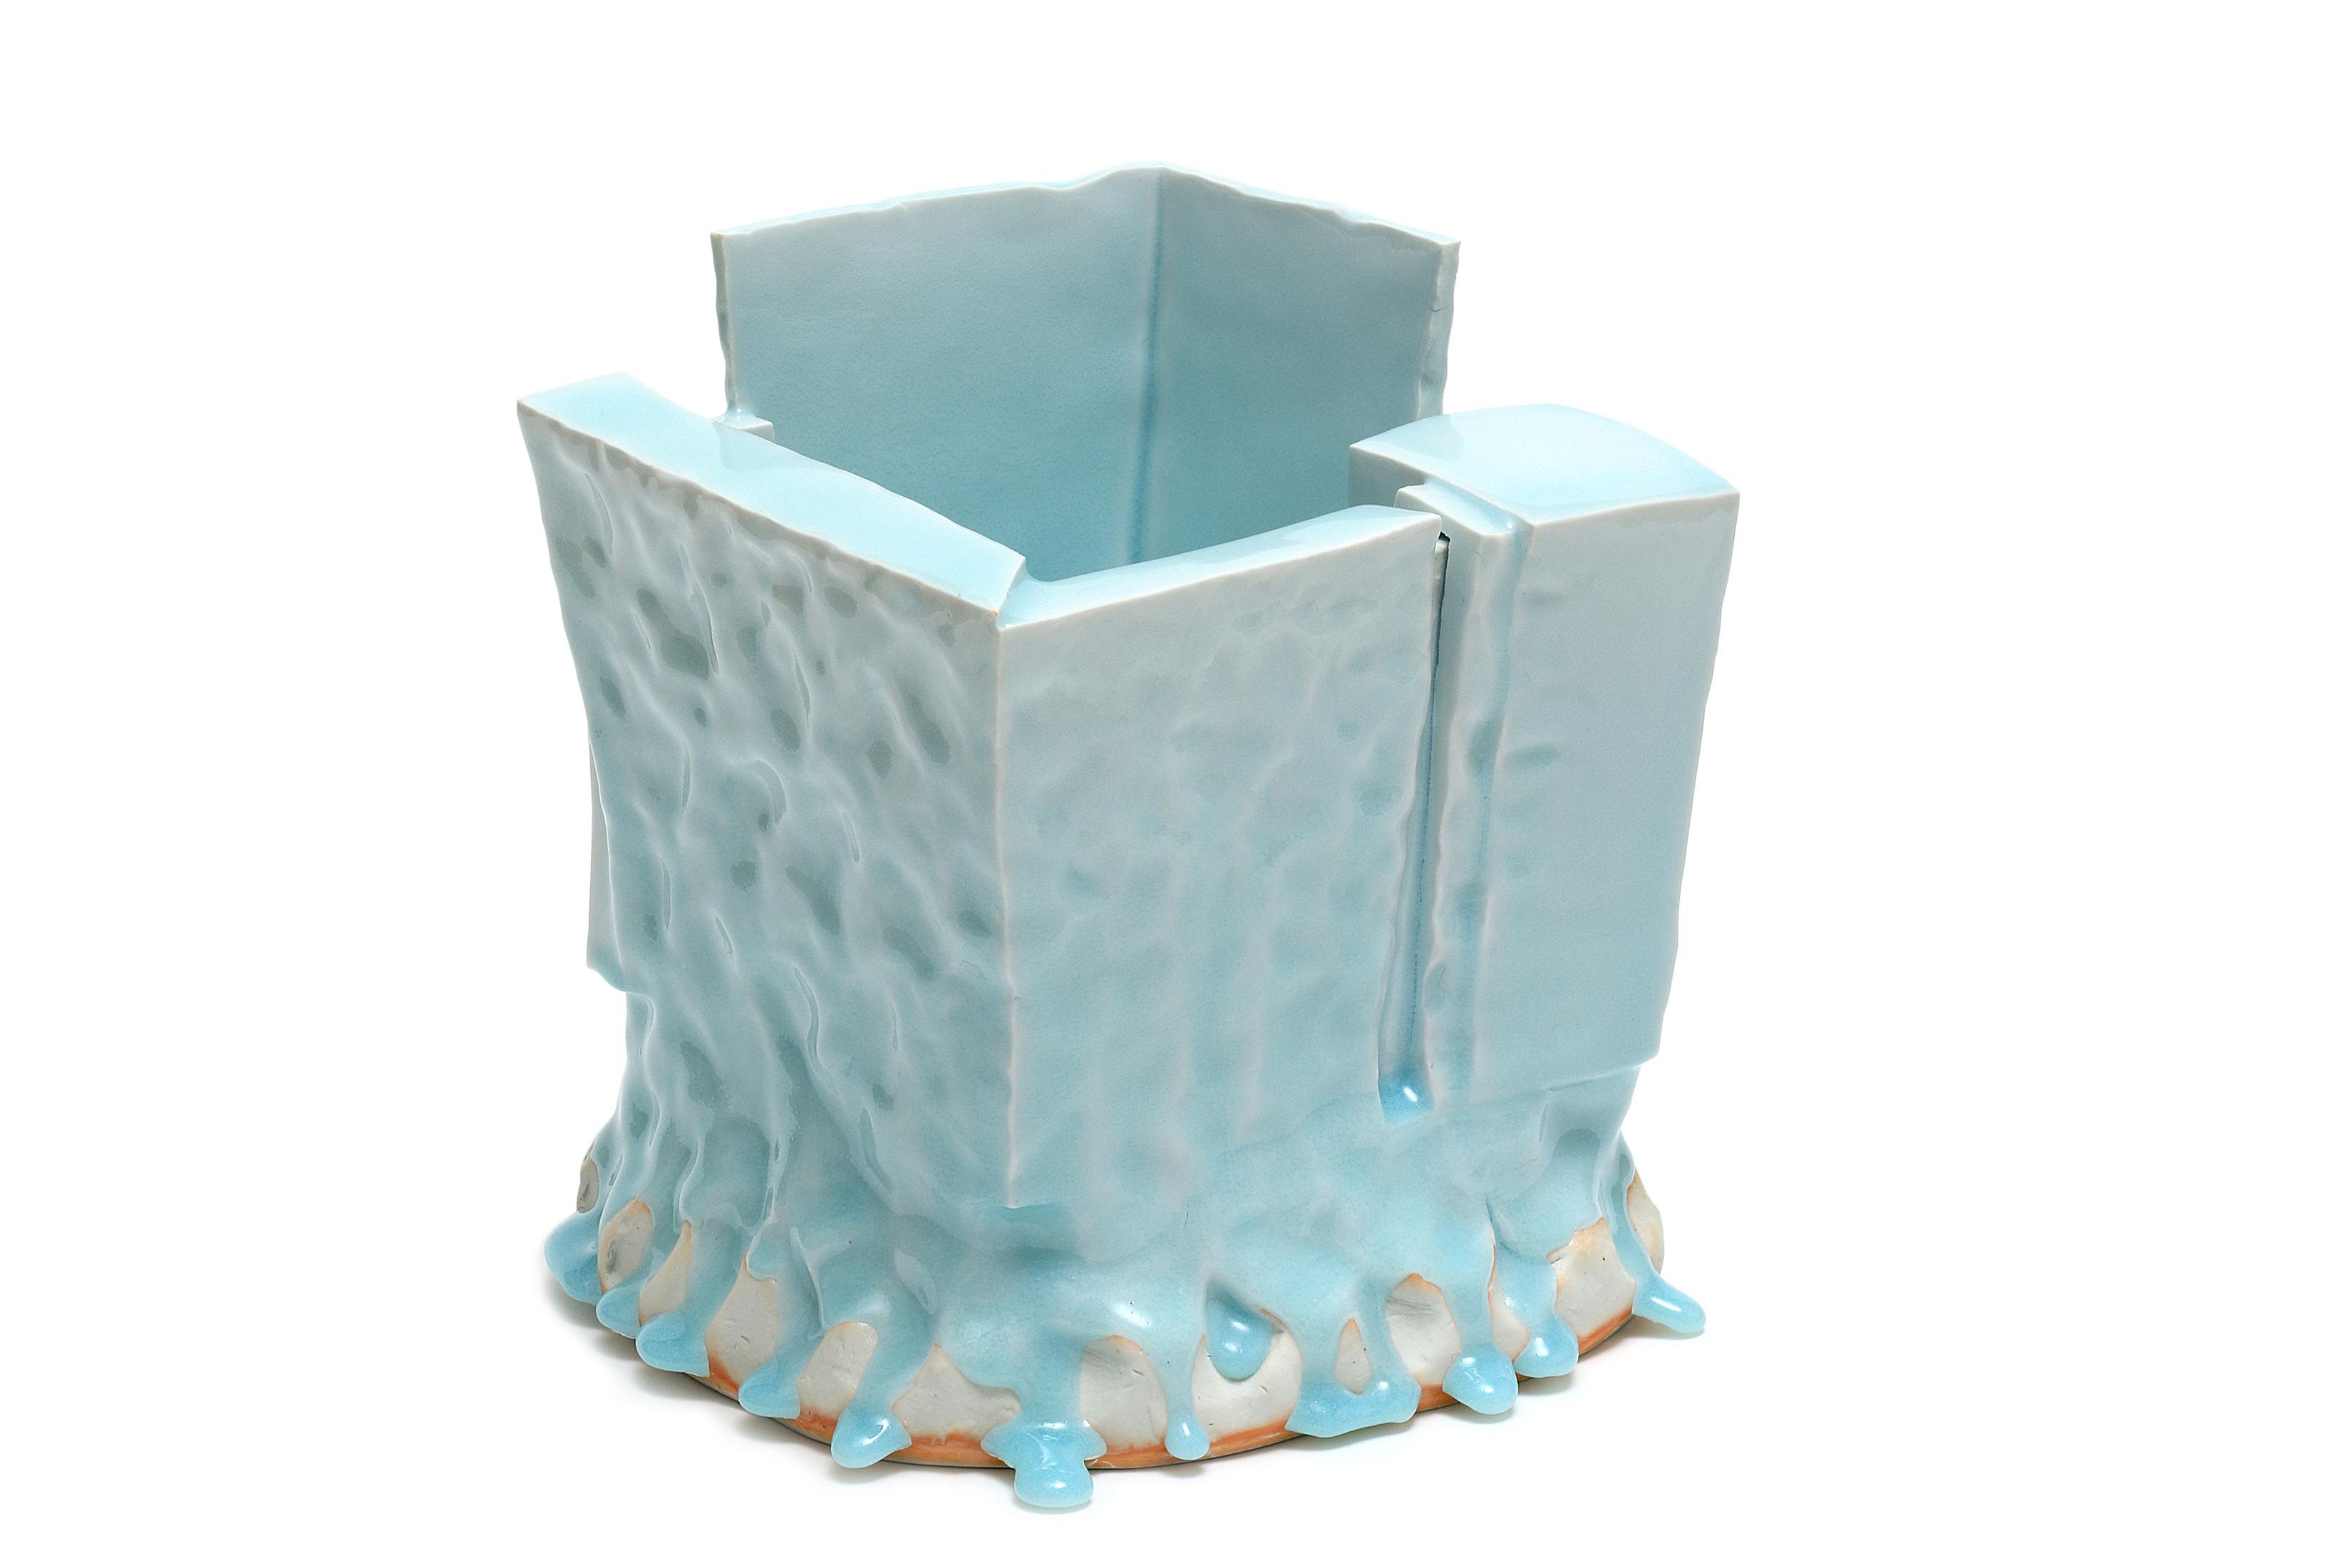 Masamichi Yoshikawa –Sculpture –2020-Galerie Metzger Contemprary Art Ceramic Kunst Keramik Gallery